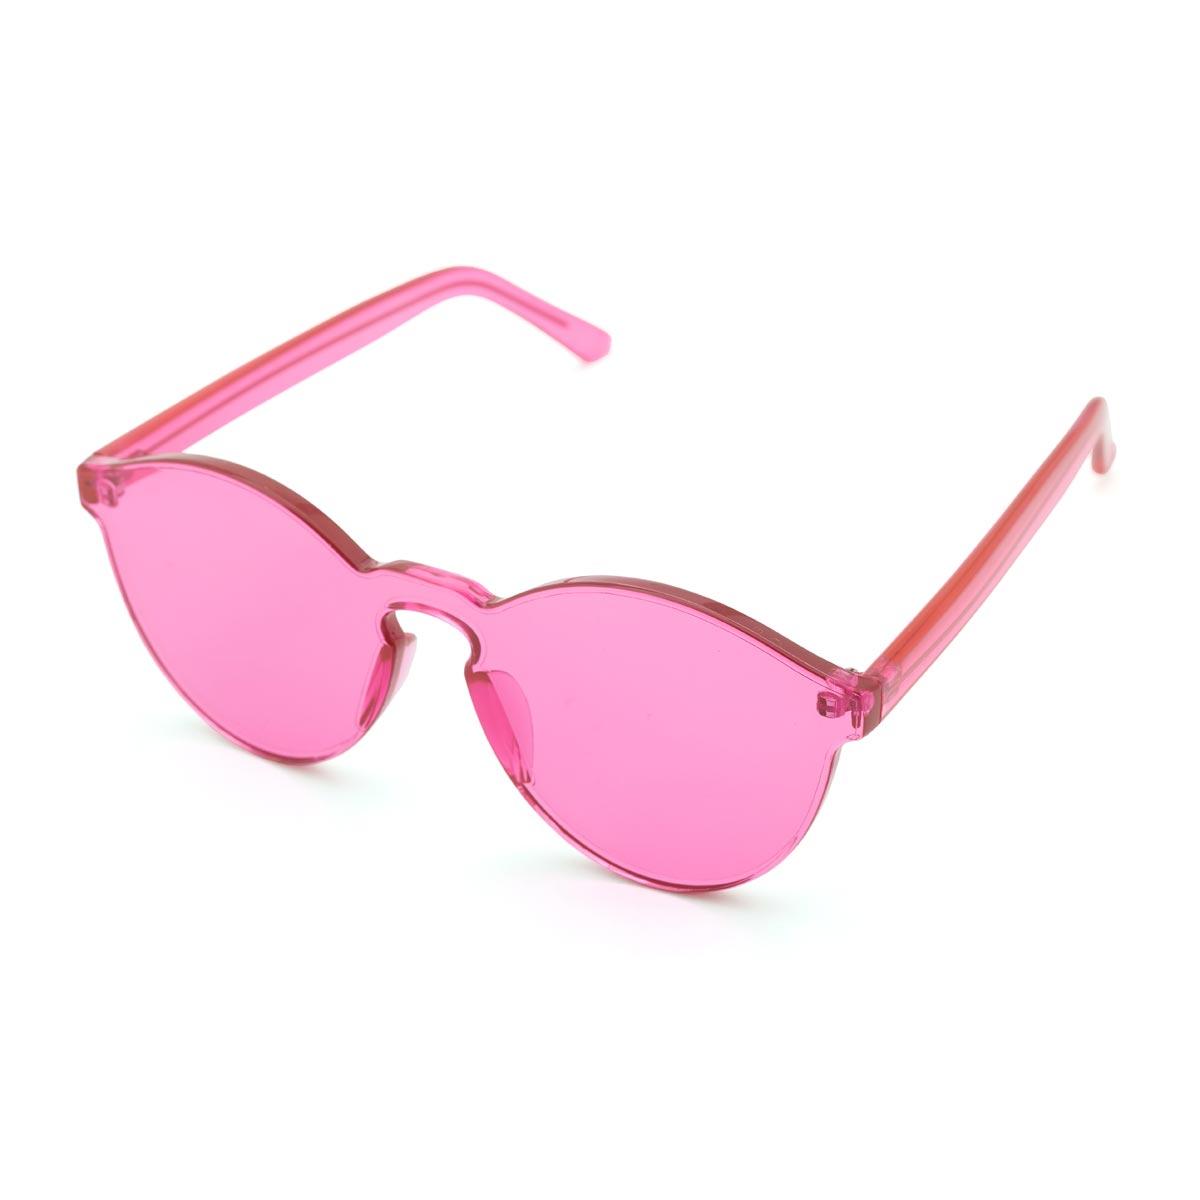 Pink Rimless Glasses : Pink Rimless Sunglasses